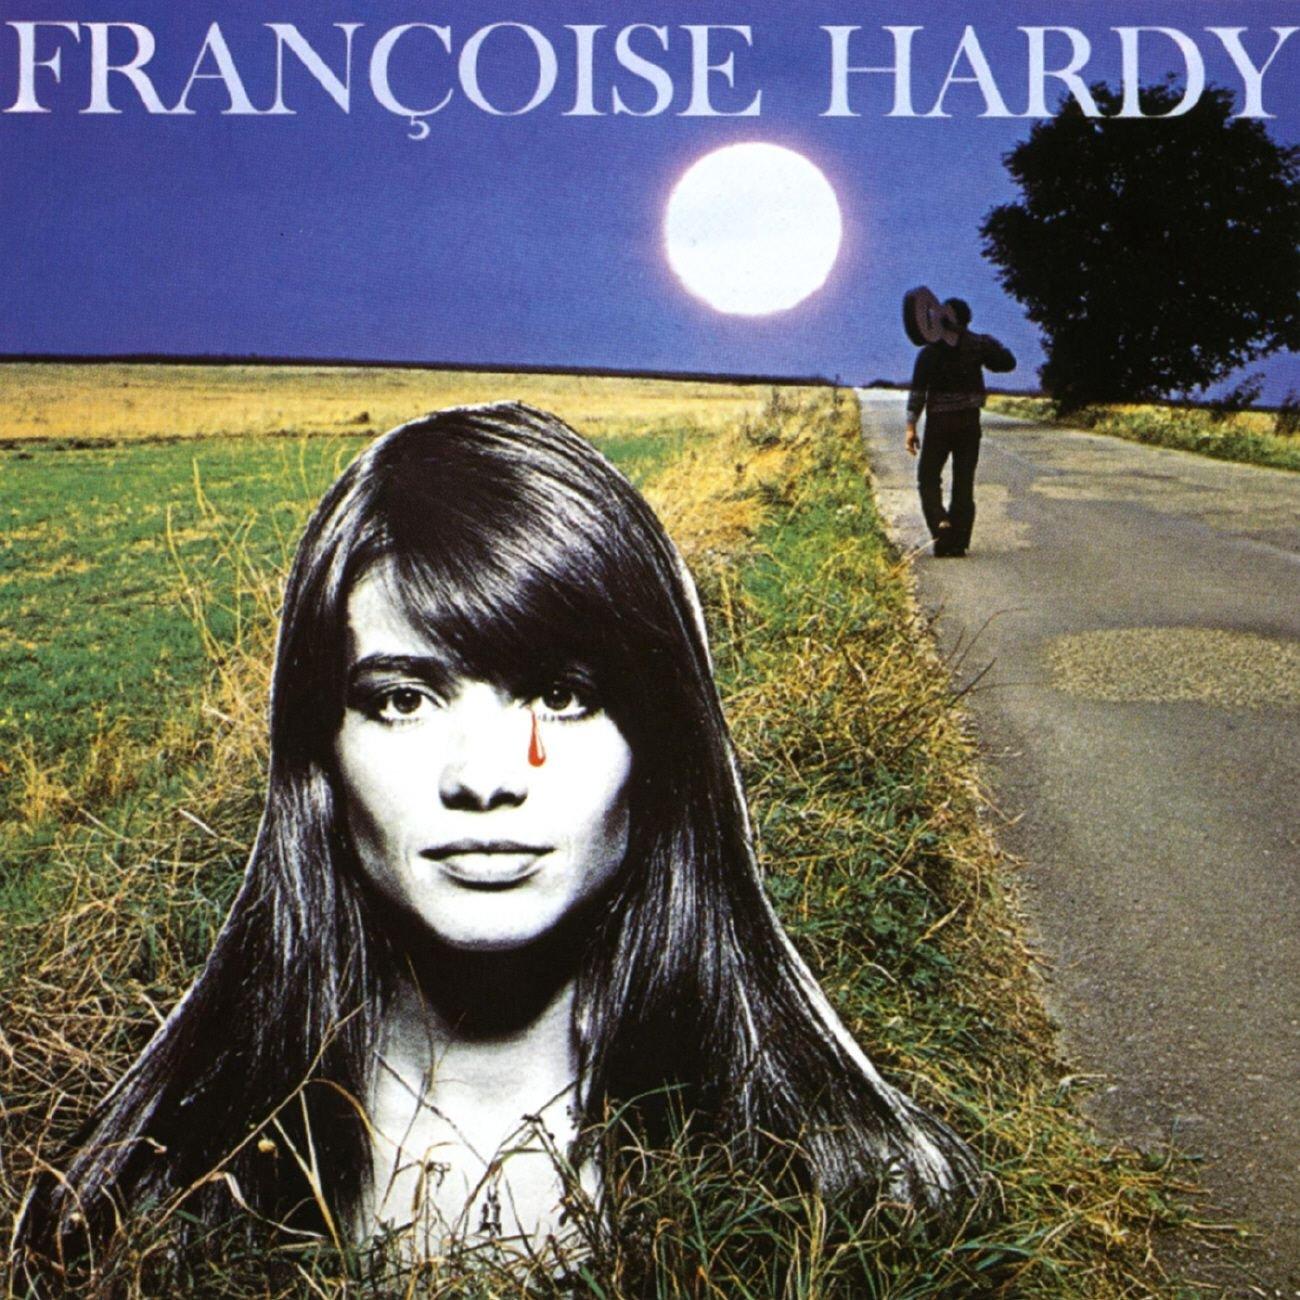 FRANCOISE HARDY - SOLEIL (CD)